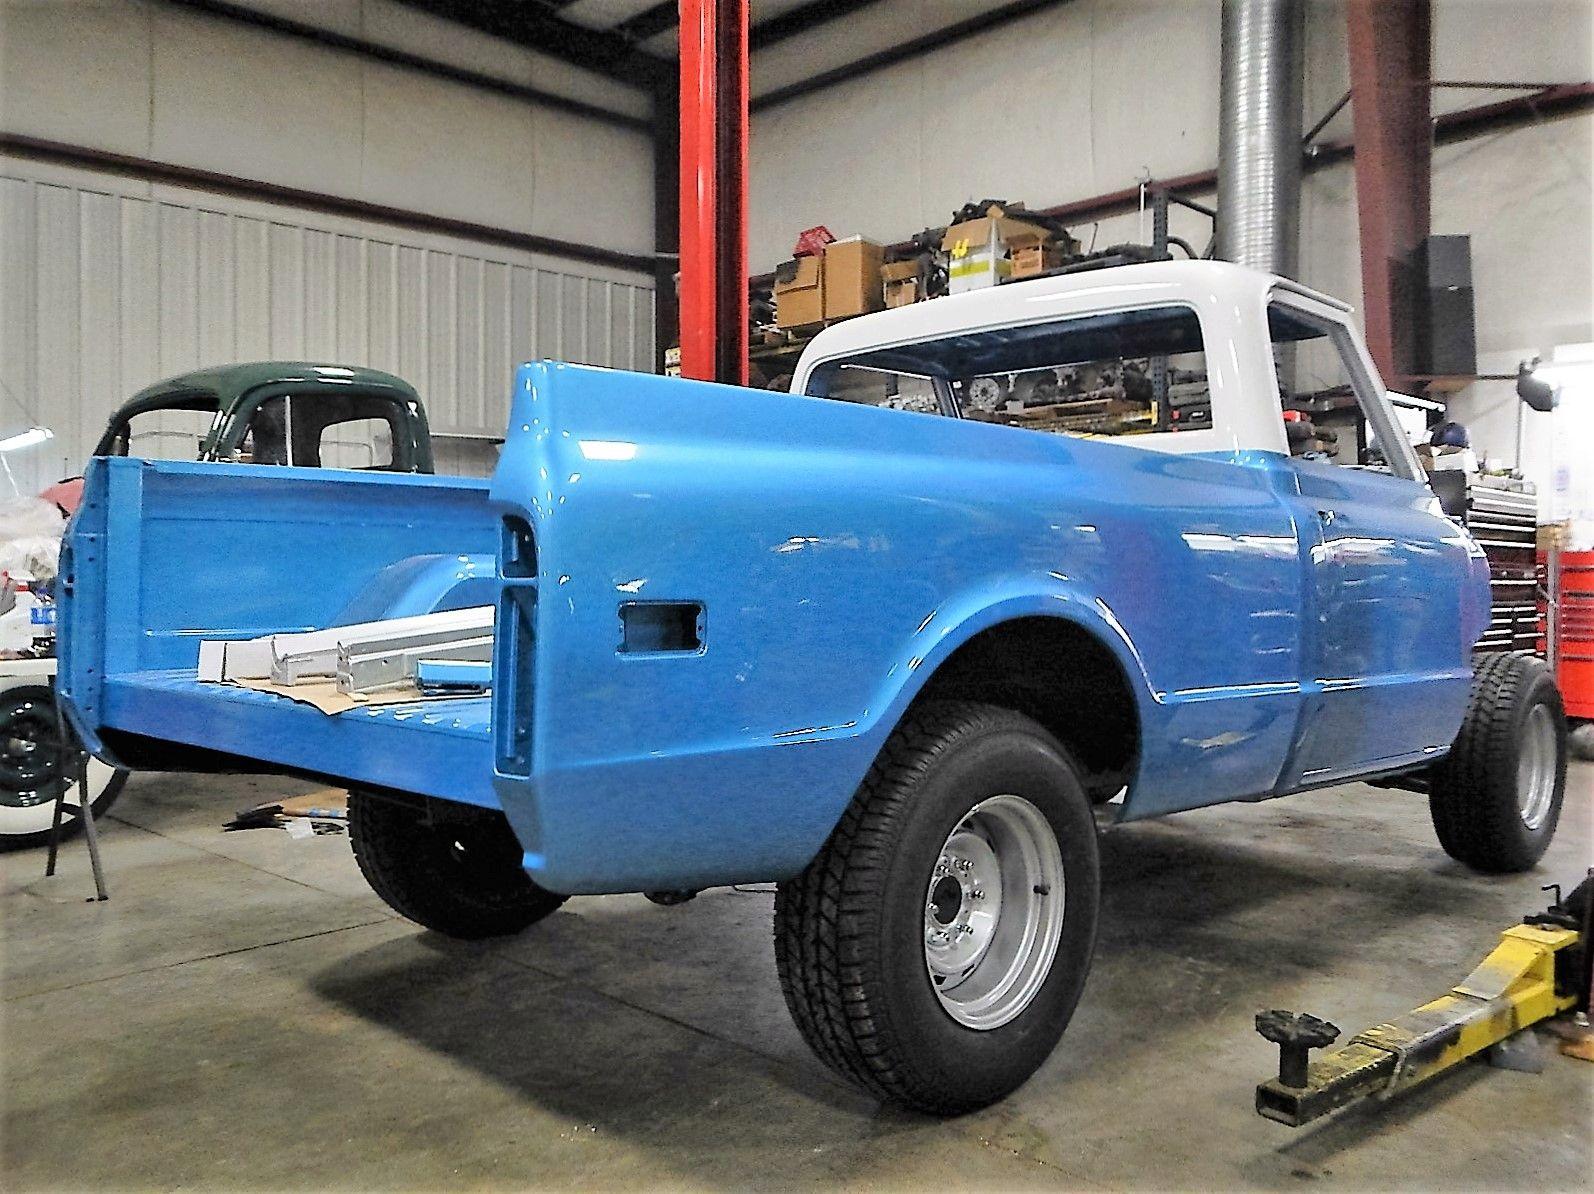 1968 C-10 Restoration - wheels 009.jpg